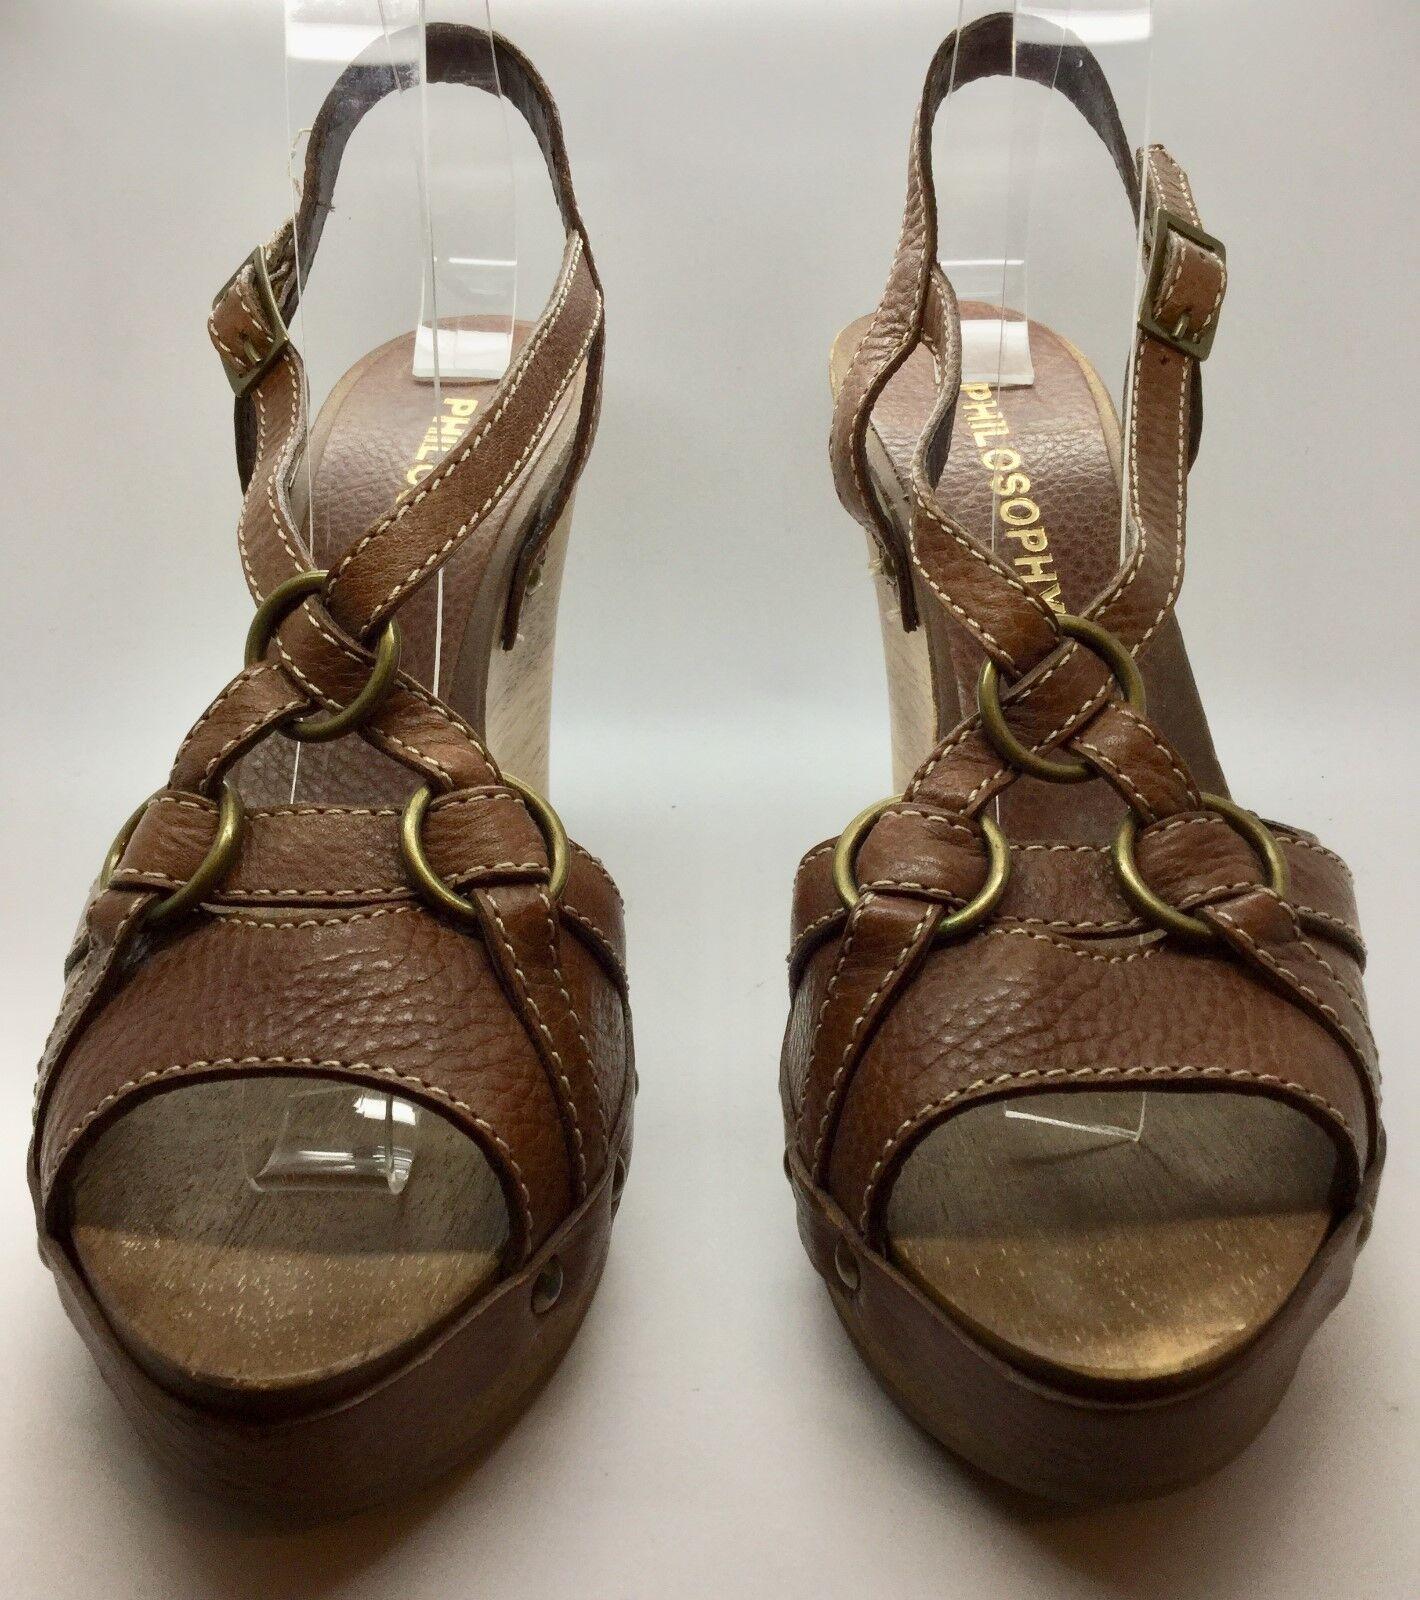 PHILOSOPHY Braun Leder Strappy Wedge Sandale Größe 39